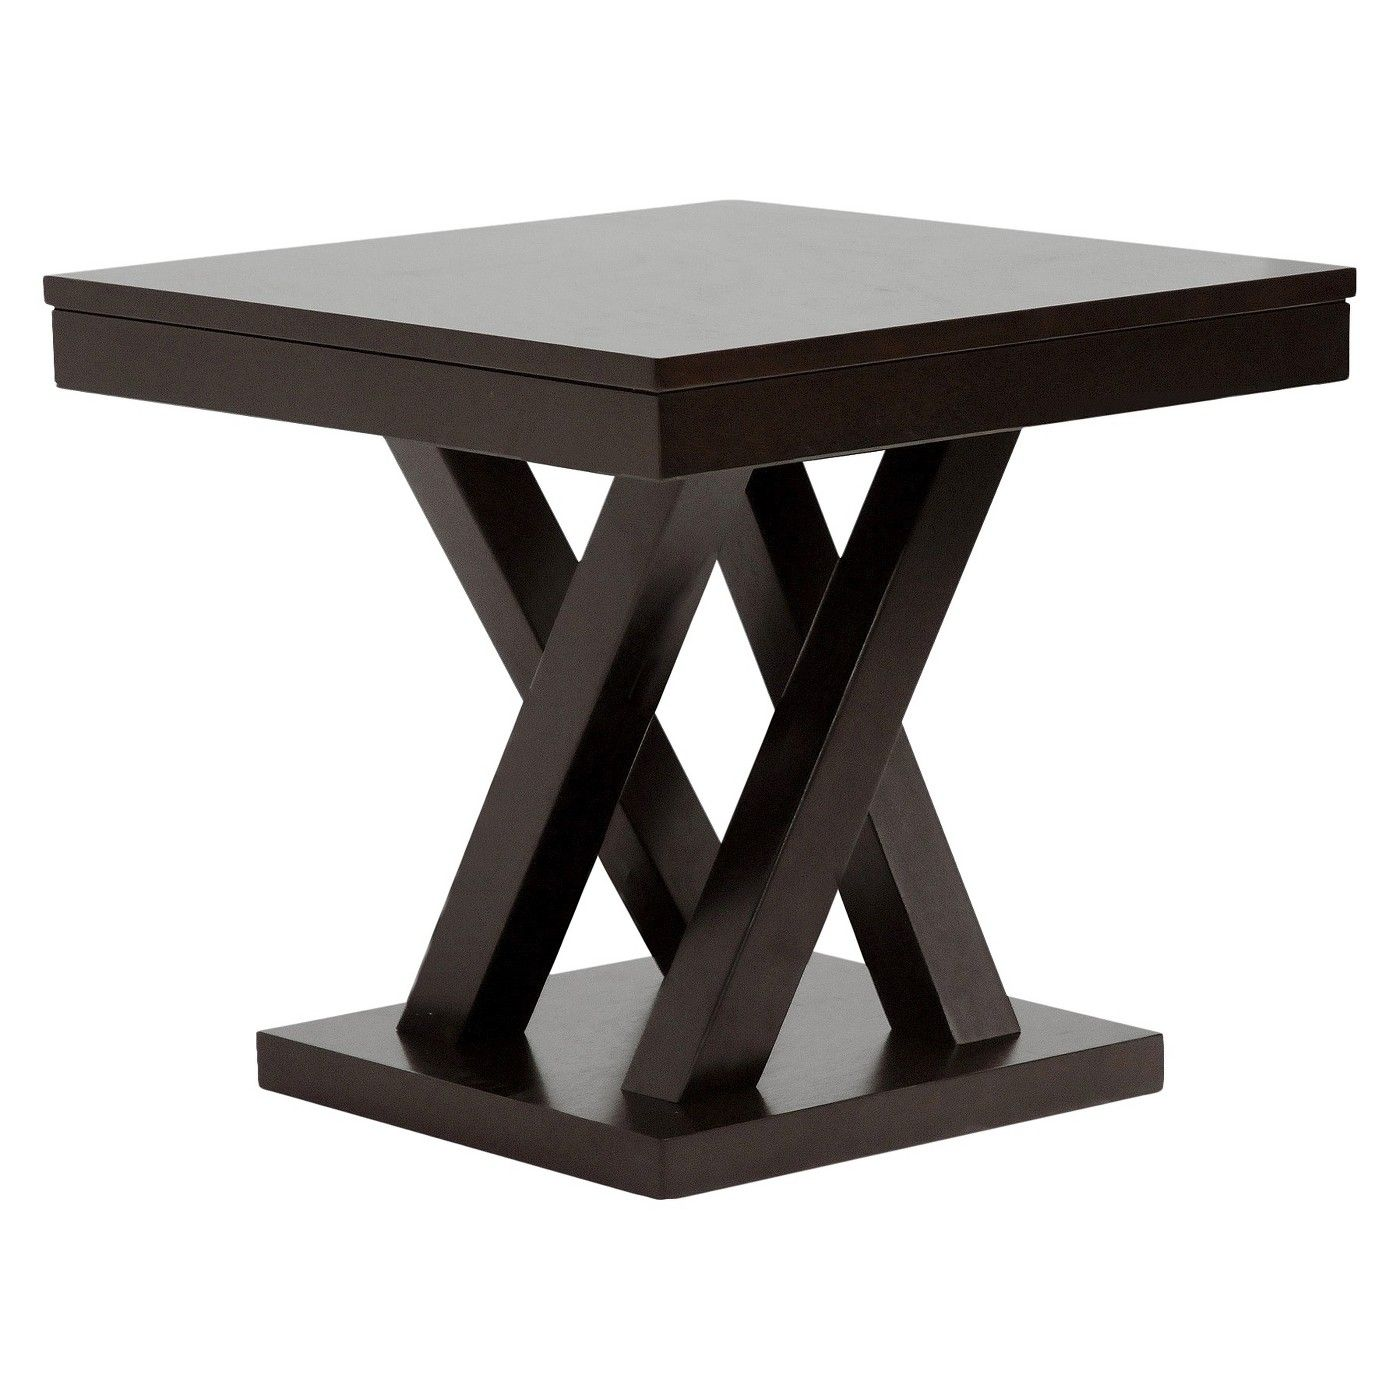 Everdon Modern End Table Dark Brown Baxton Studio Modern End Tables End Tables Pub Table Sets [ 1400 x 1400 Pixel ]